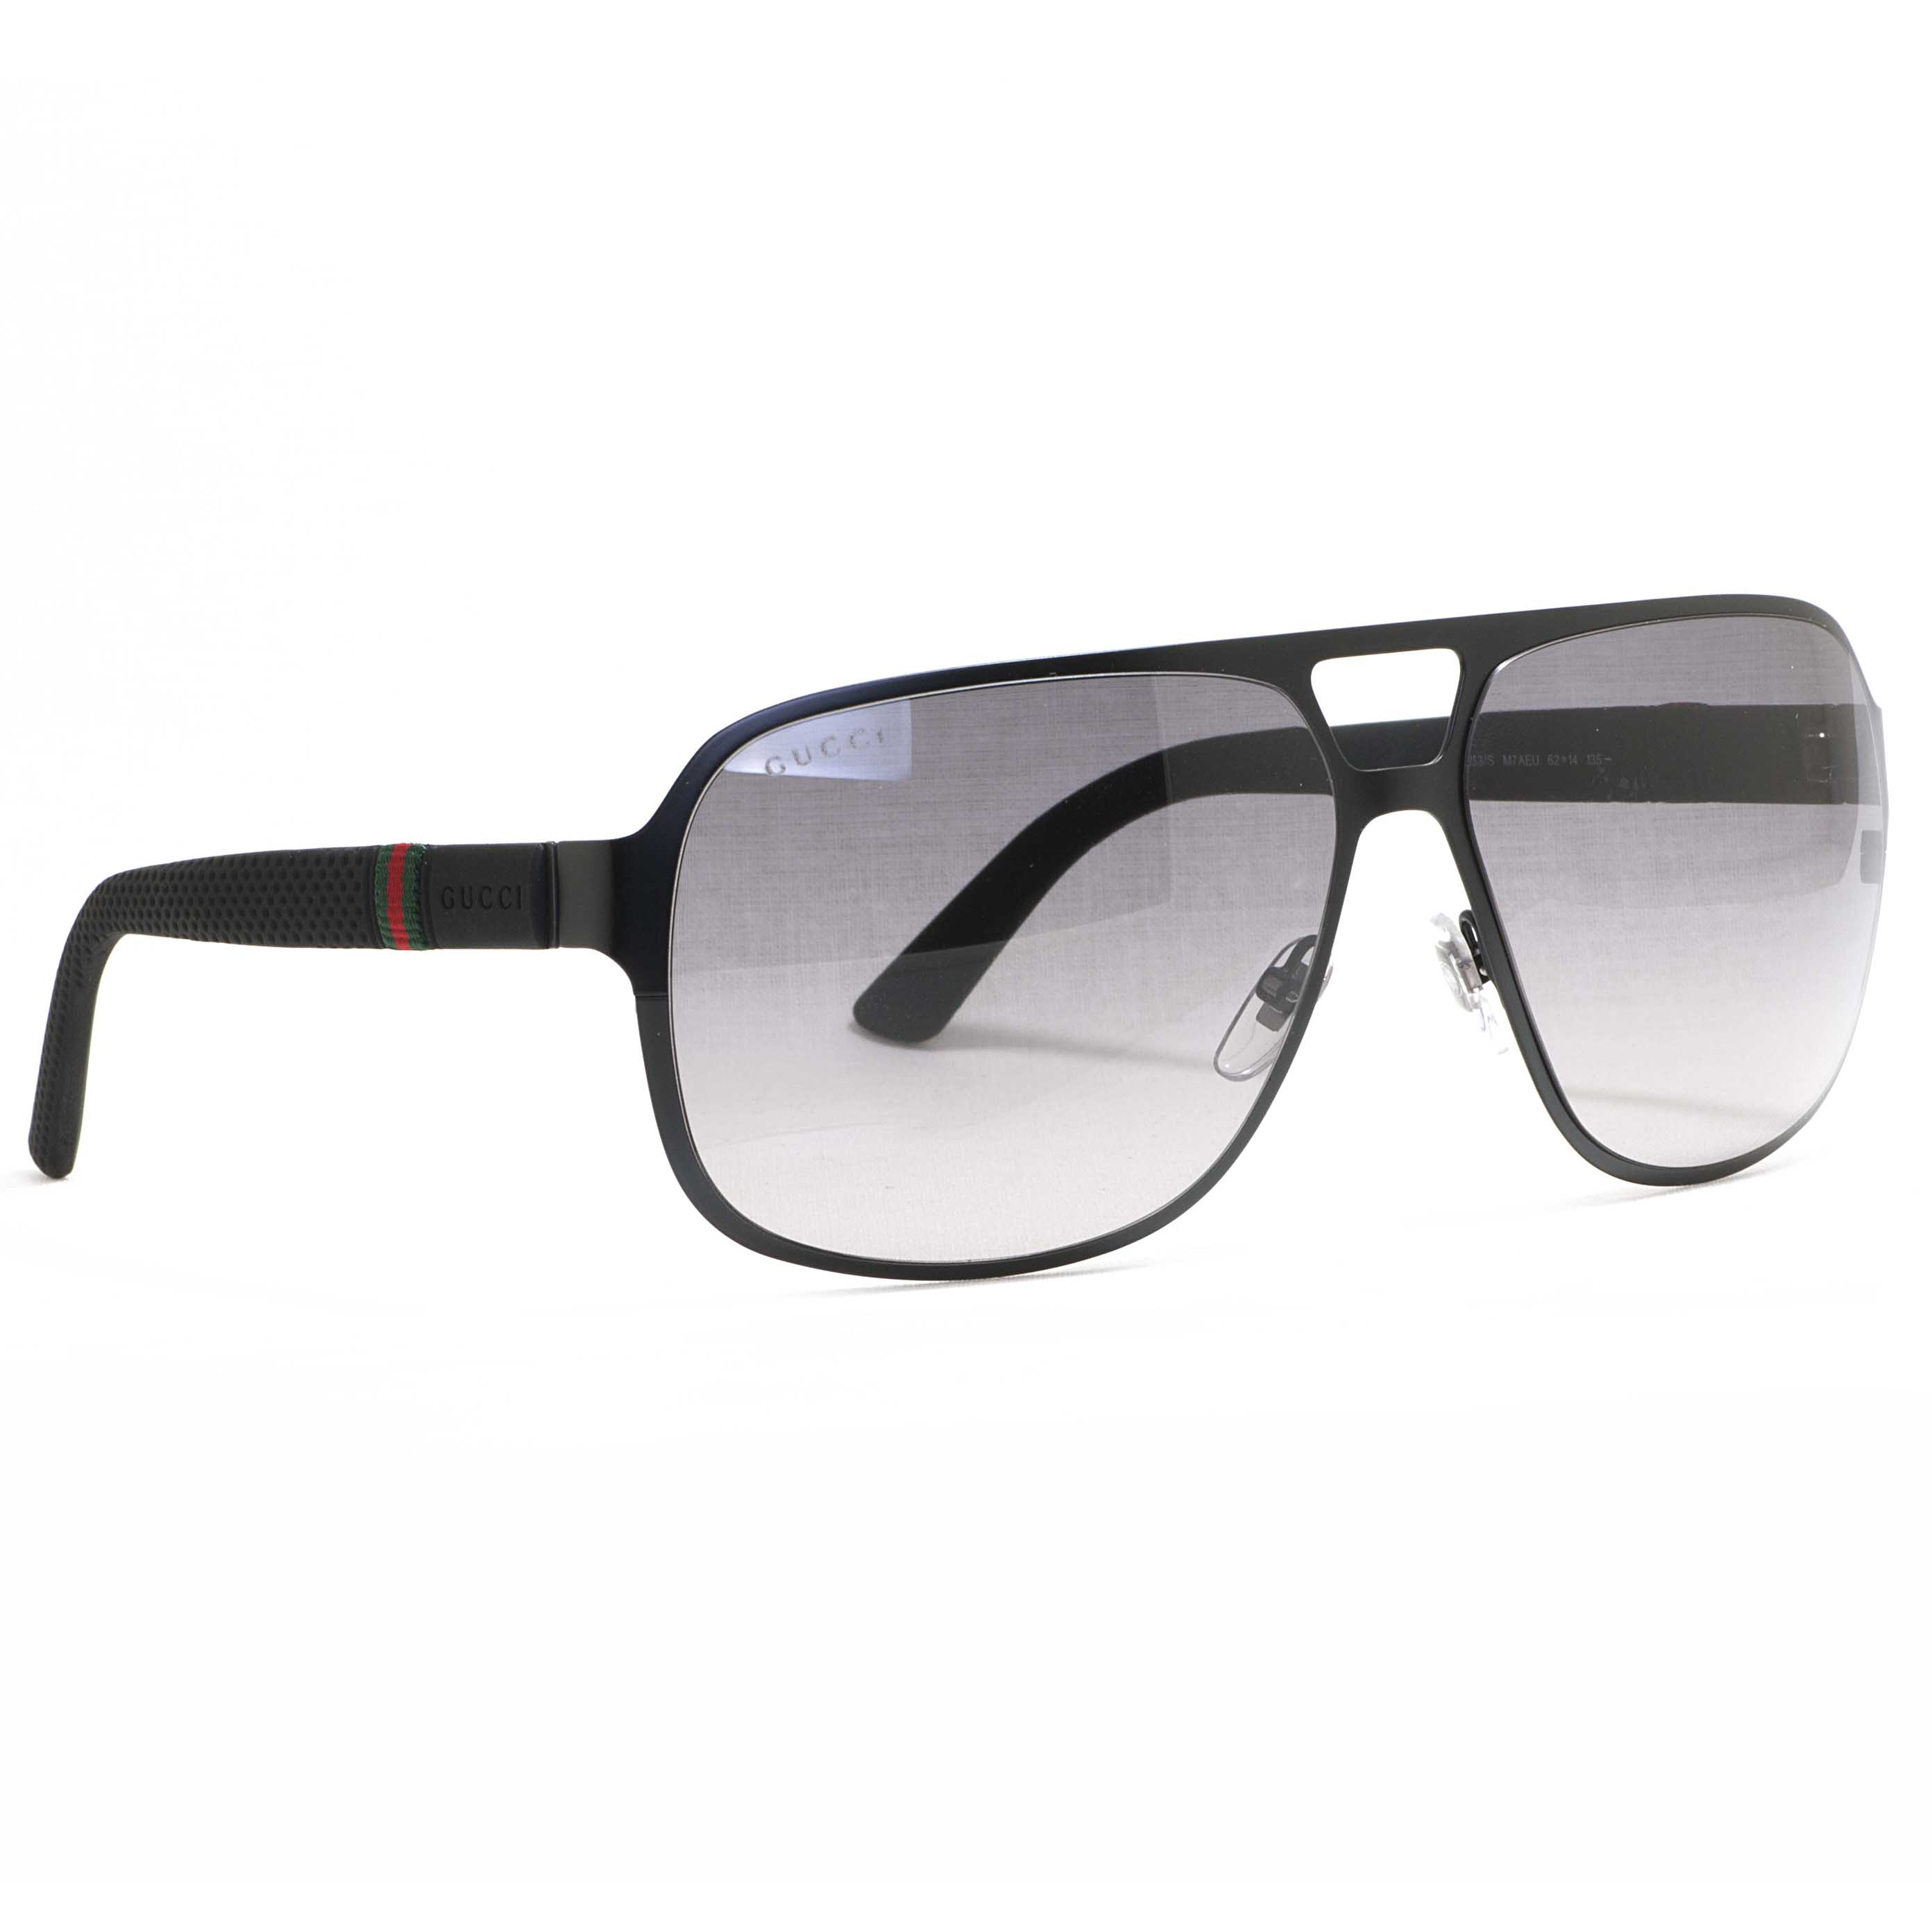 2a75e20a7aa56 GUCCI - Gucci GG 2253 S 0M7A EU Semi Matte Black Grey Gradient Men s Aviator  Sunglasses - Walmart.com